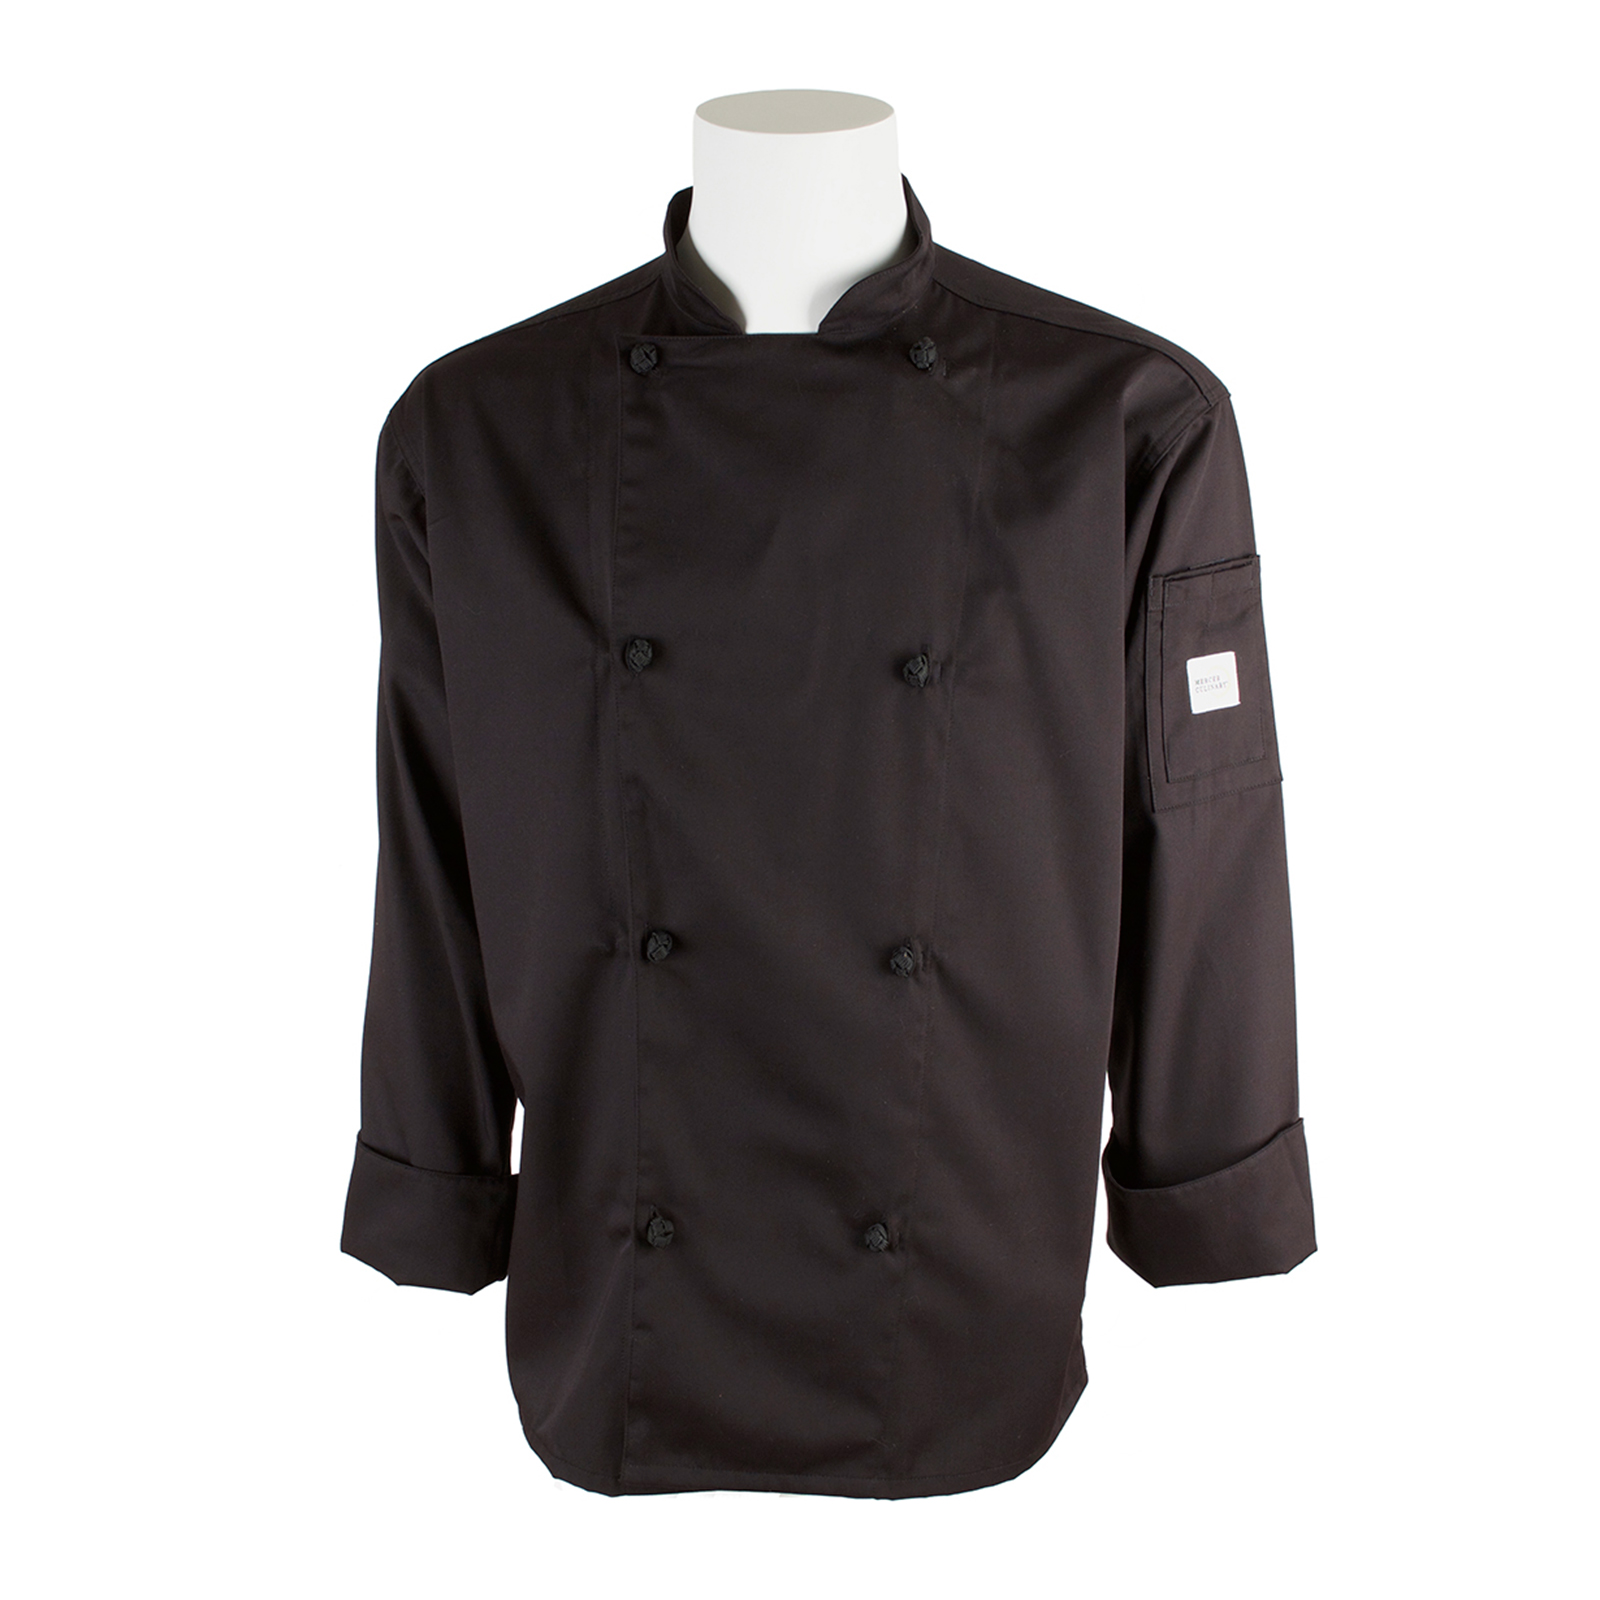 Mercer Culinary M61020BK5X chef's coat